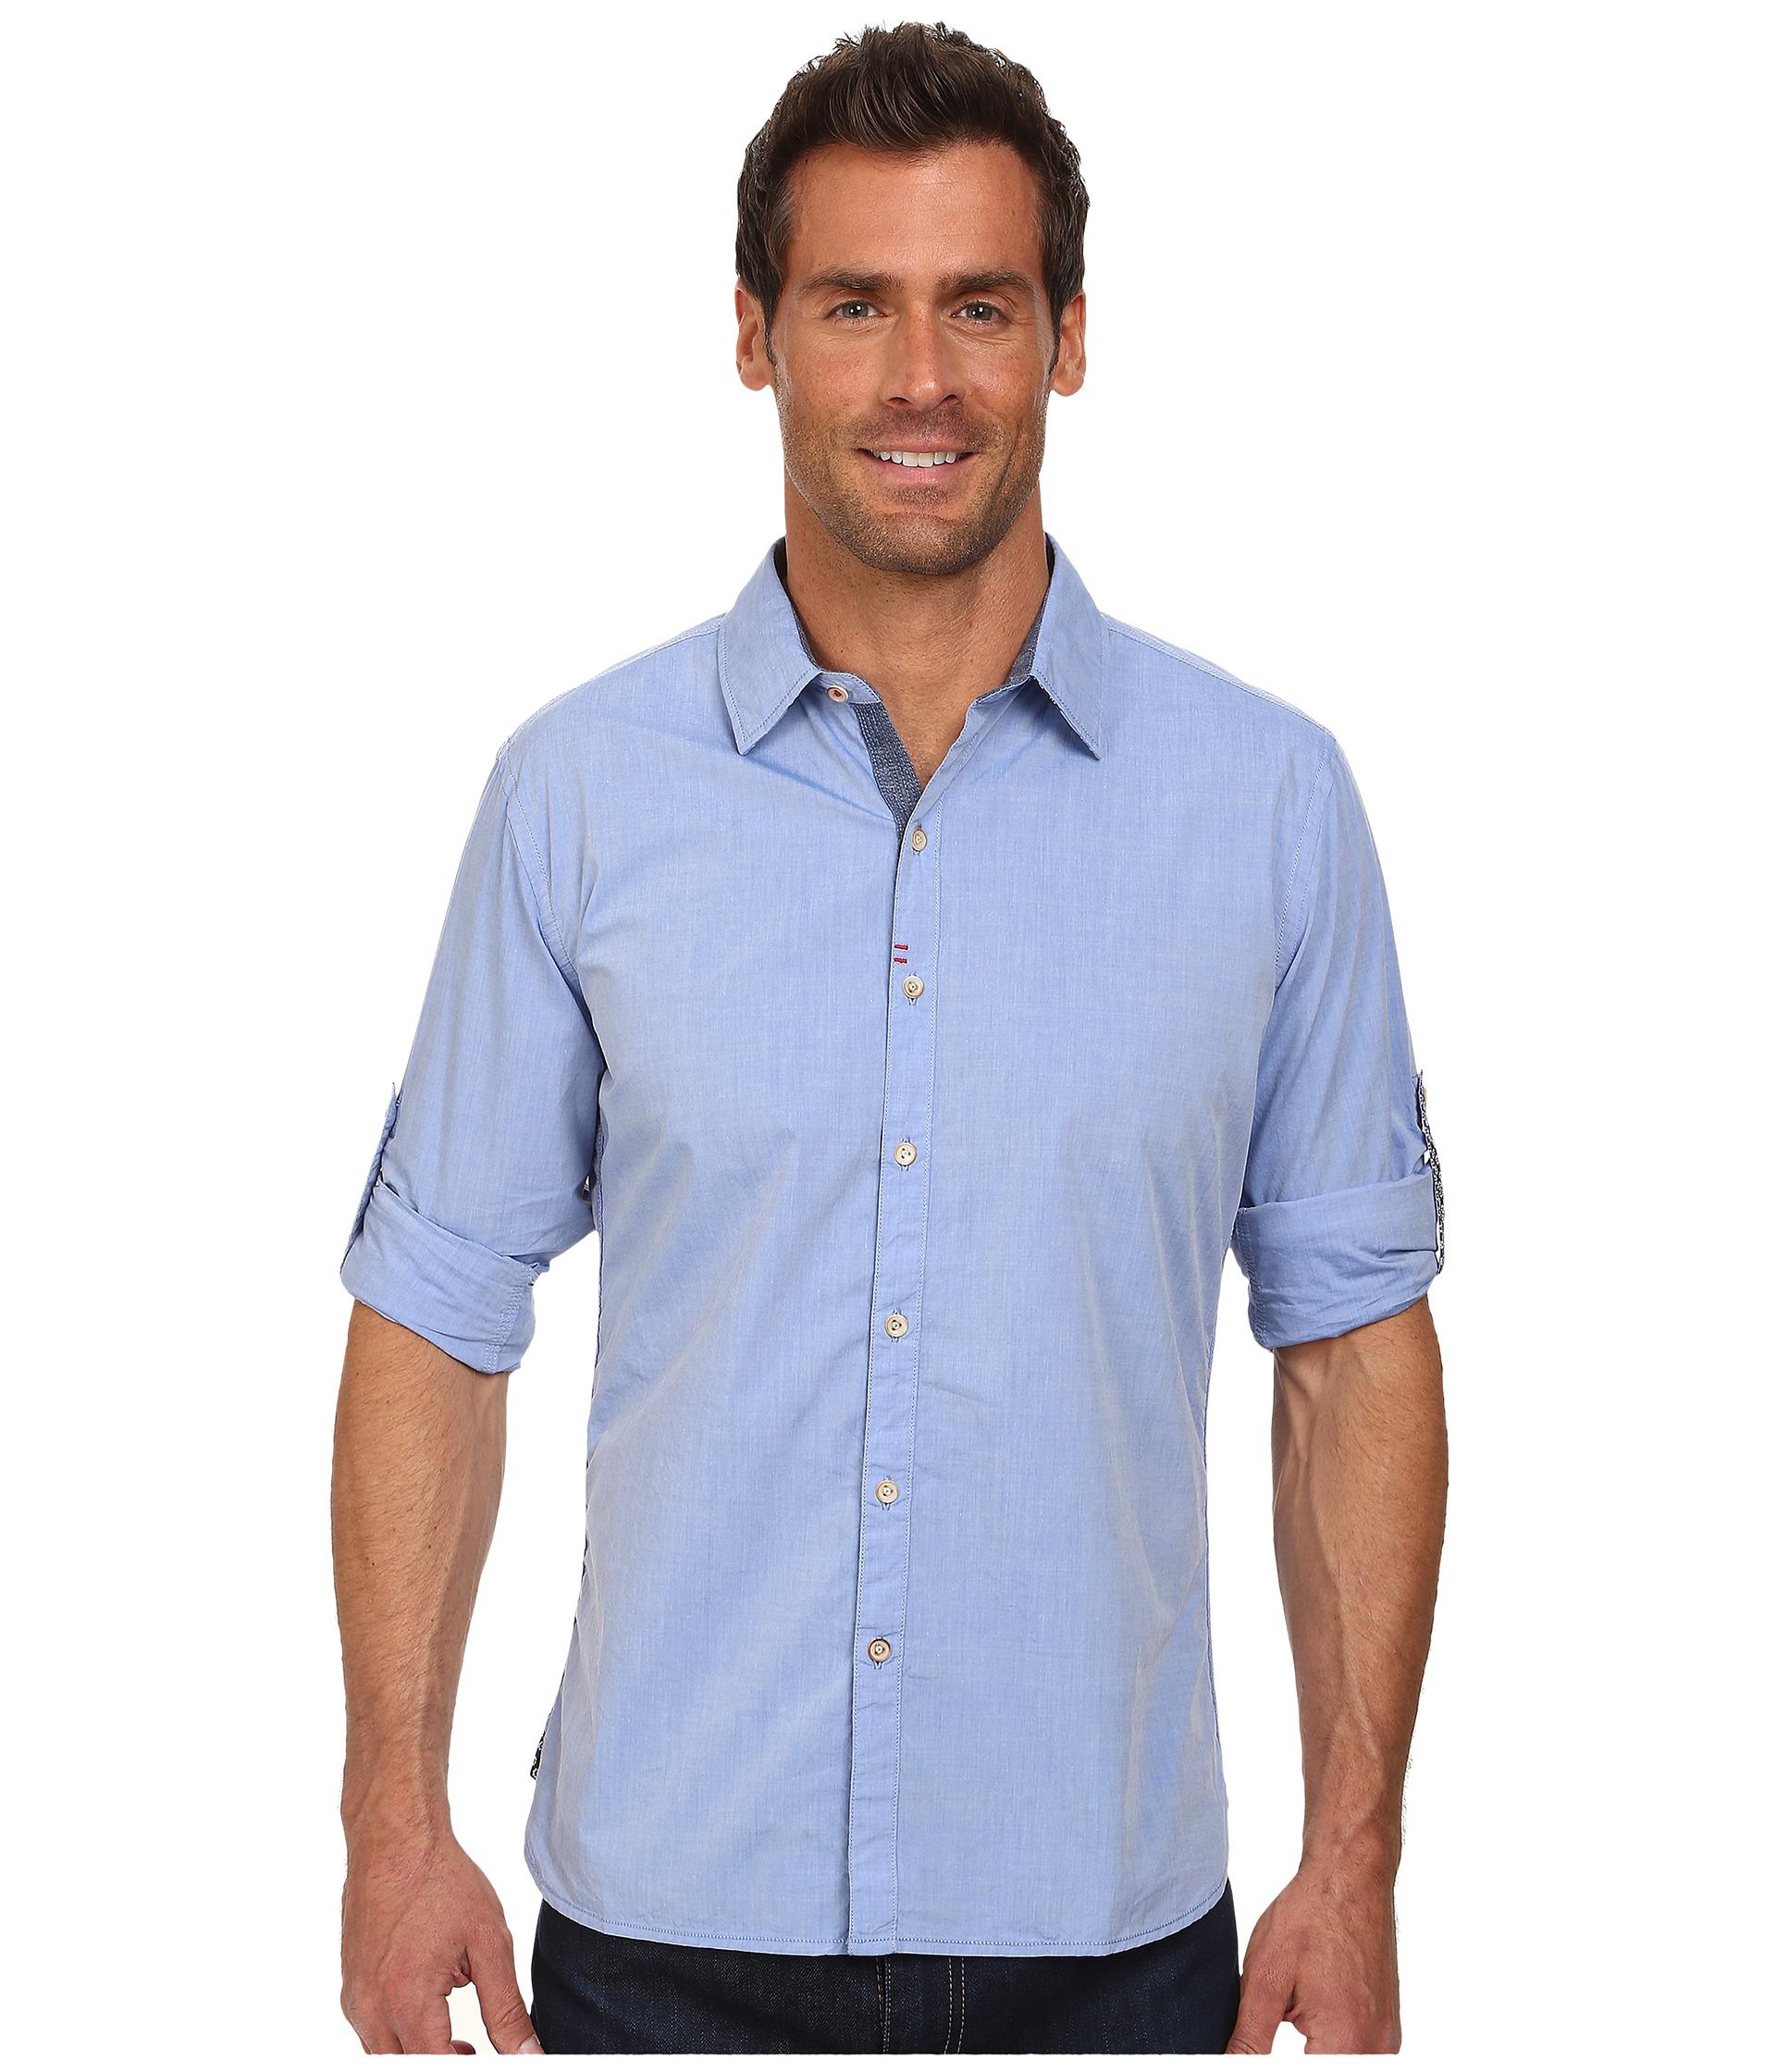 Robert graham coconut grove tailored fit long sleeve woven for Robert graham sport shirt